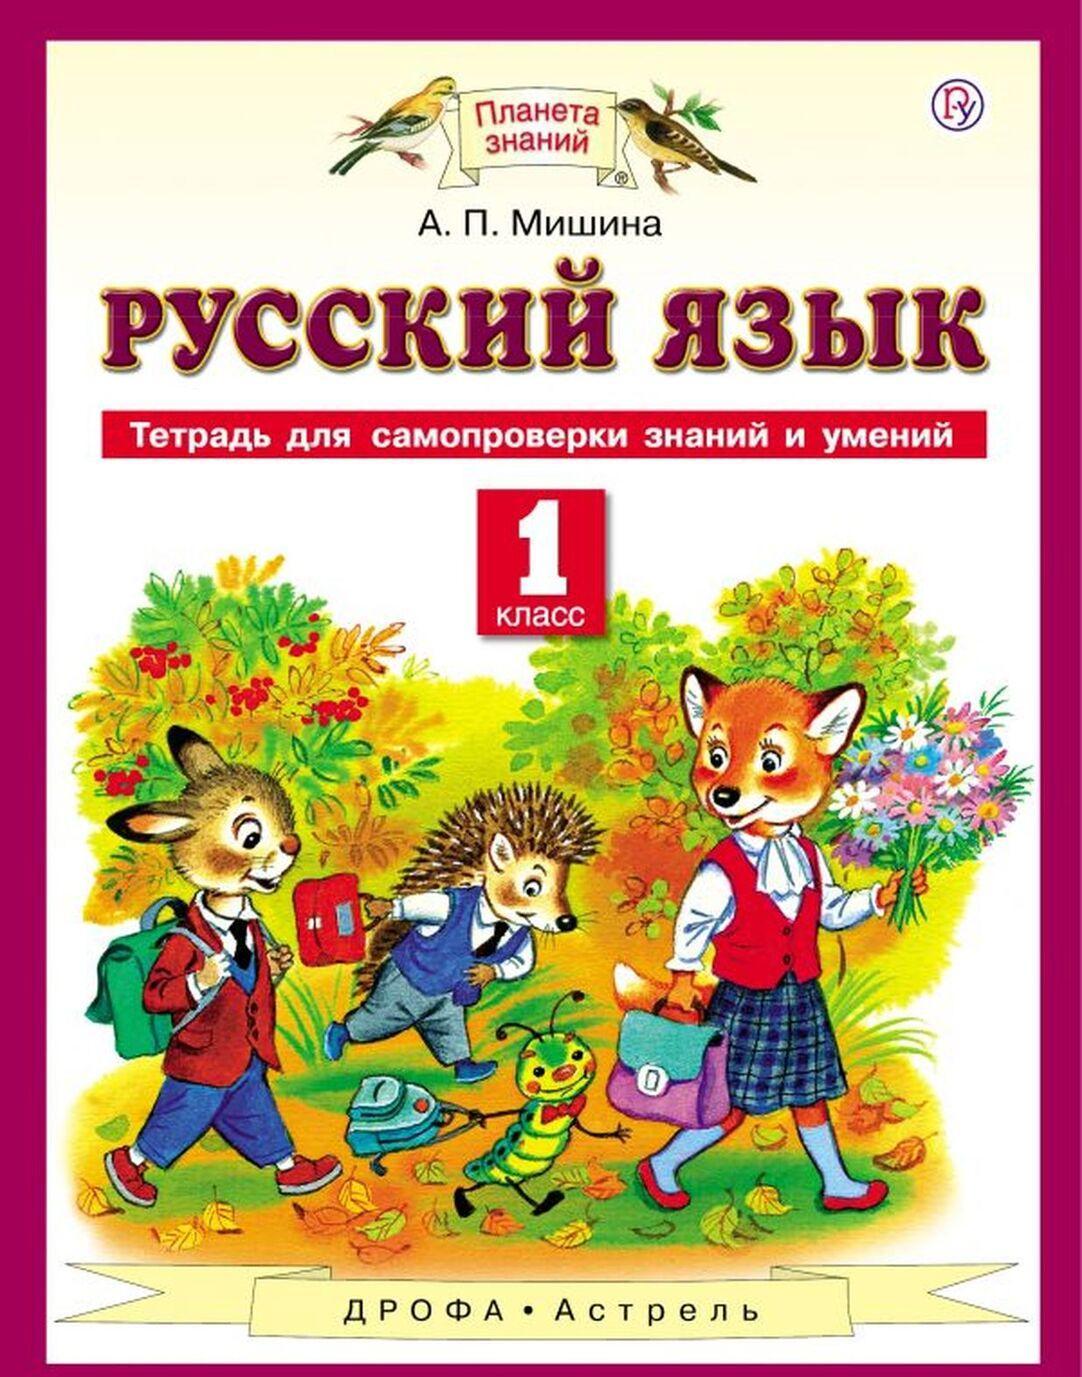 Russkij jazyk. 1 klass. Tetrad dlja samoproverki znanij i umenij | Mishina Alevtina Petrovna